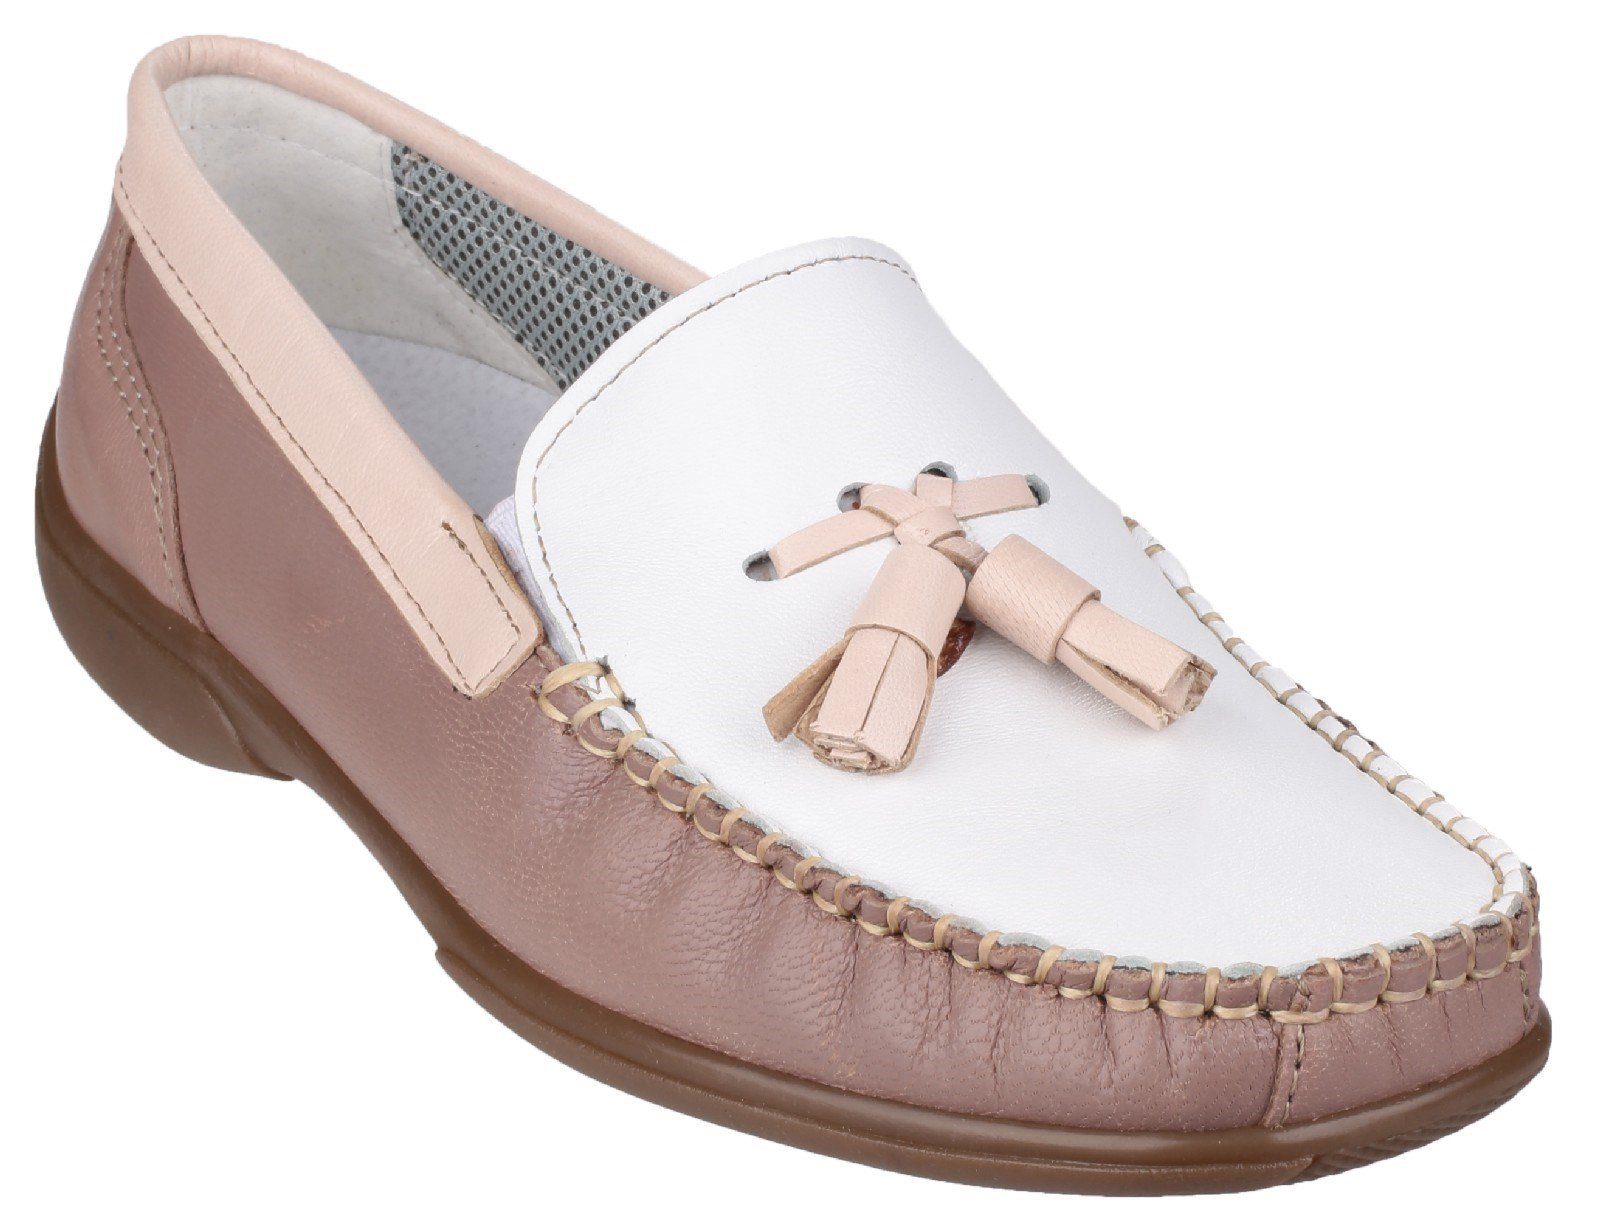 Cotswold Men's Biddlestone Slip On Loafer Shoe Various Colours 20285 - White/Beige/Tan 3